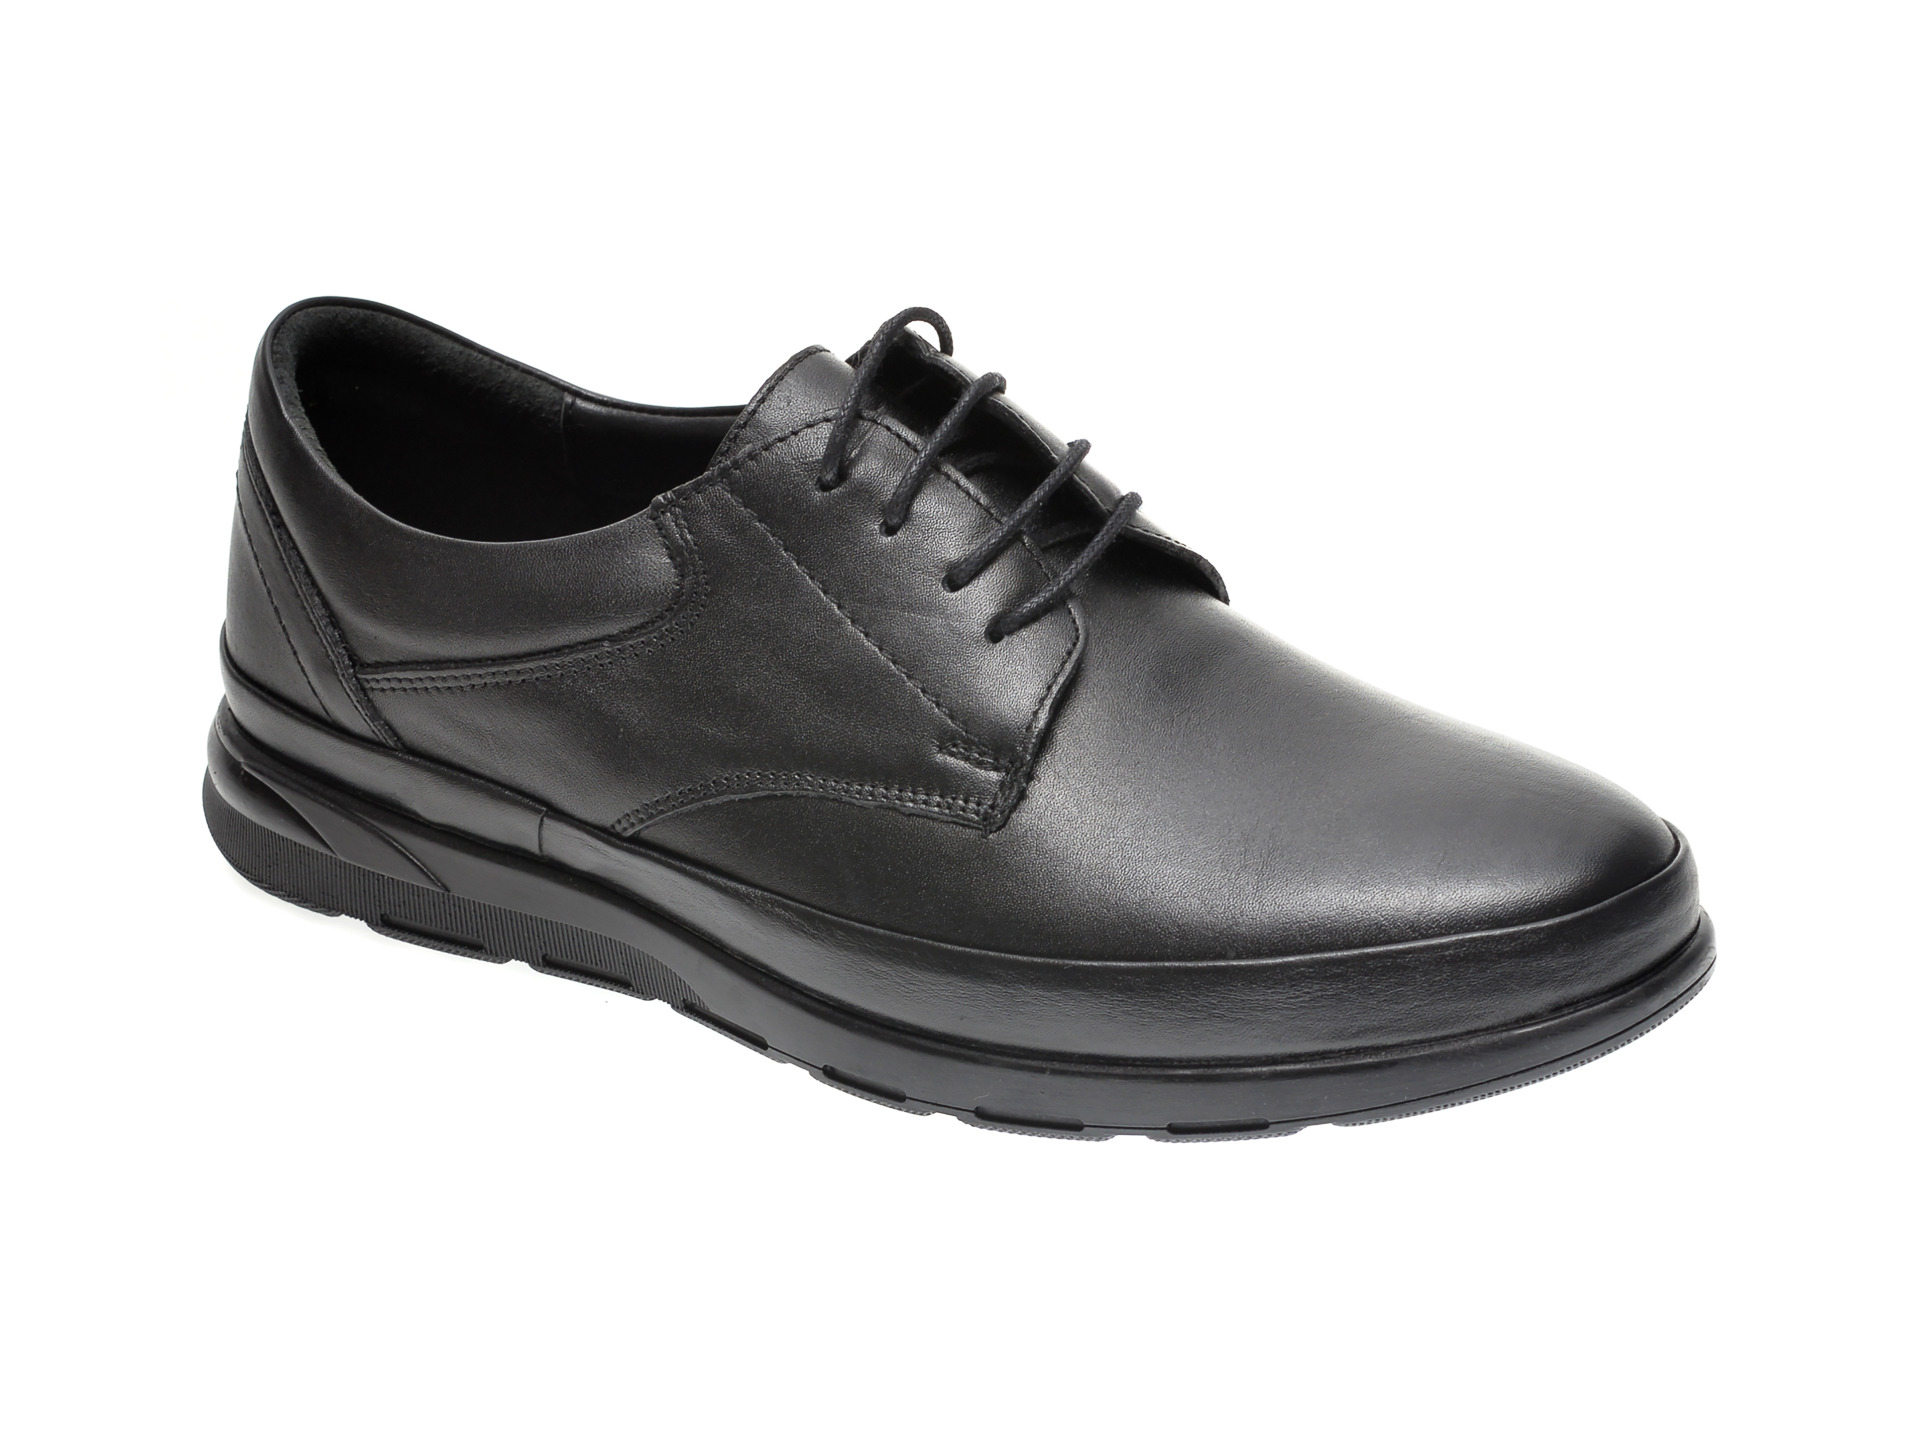 Pantofi Otter Negri, 14082, Din Piele Naturala